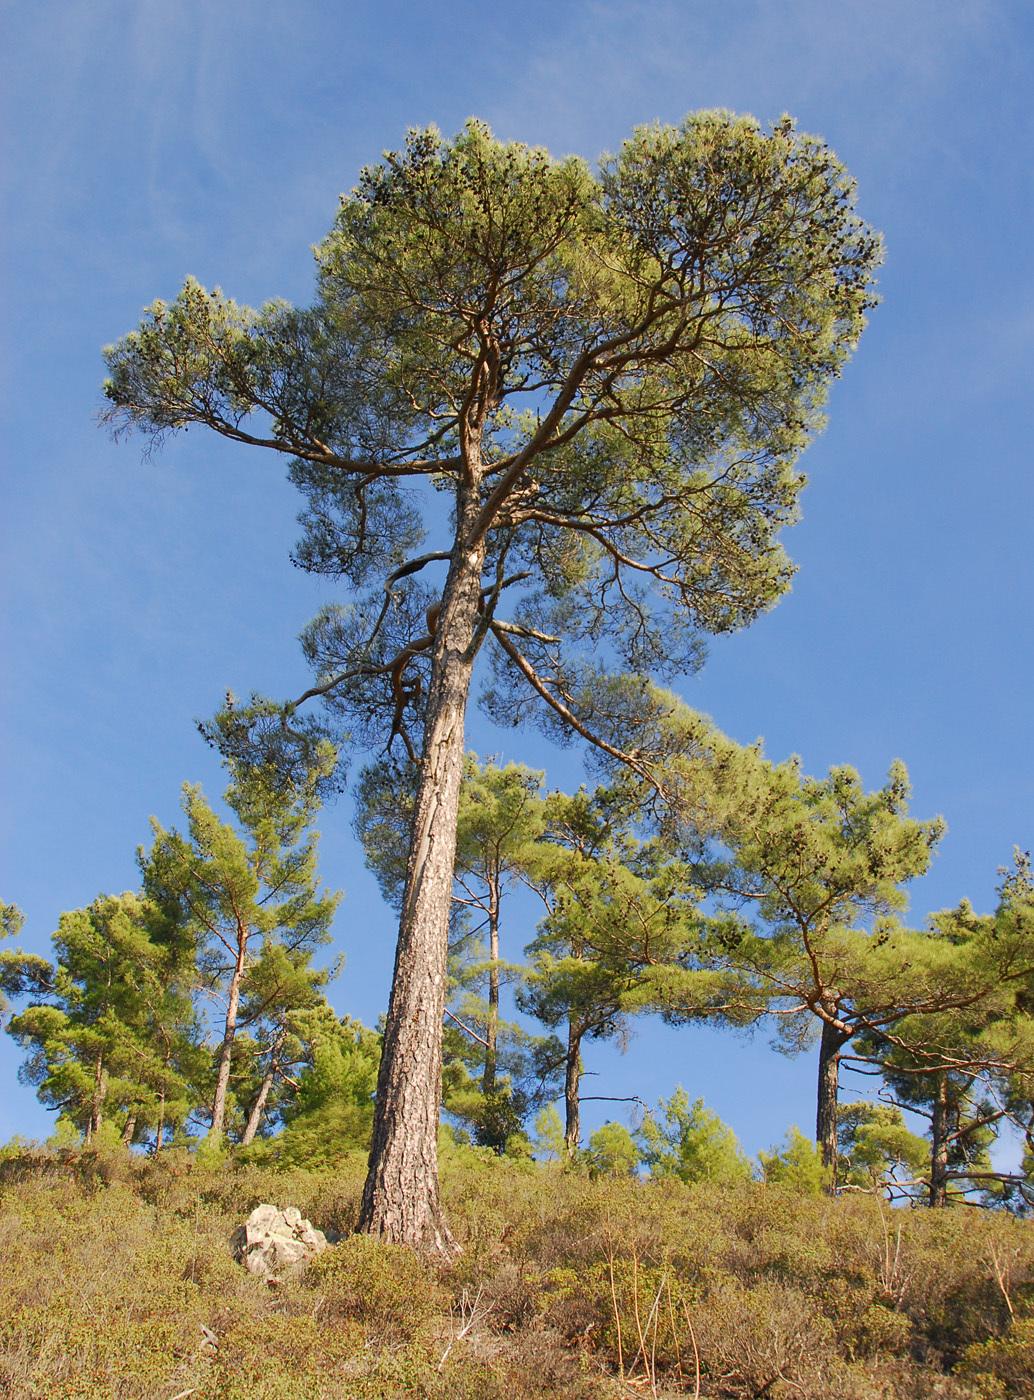 https://pictures.bgbm.org/digilib/Scaler?fn=Cyprus/Pinus_brutia_A2.jpg&mo=file